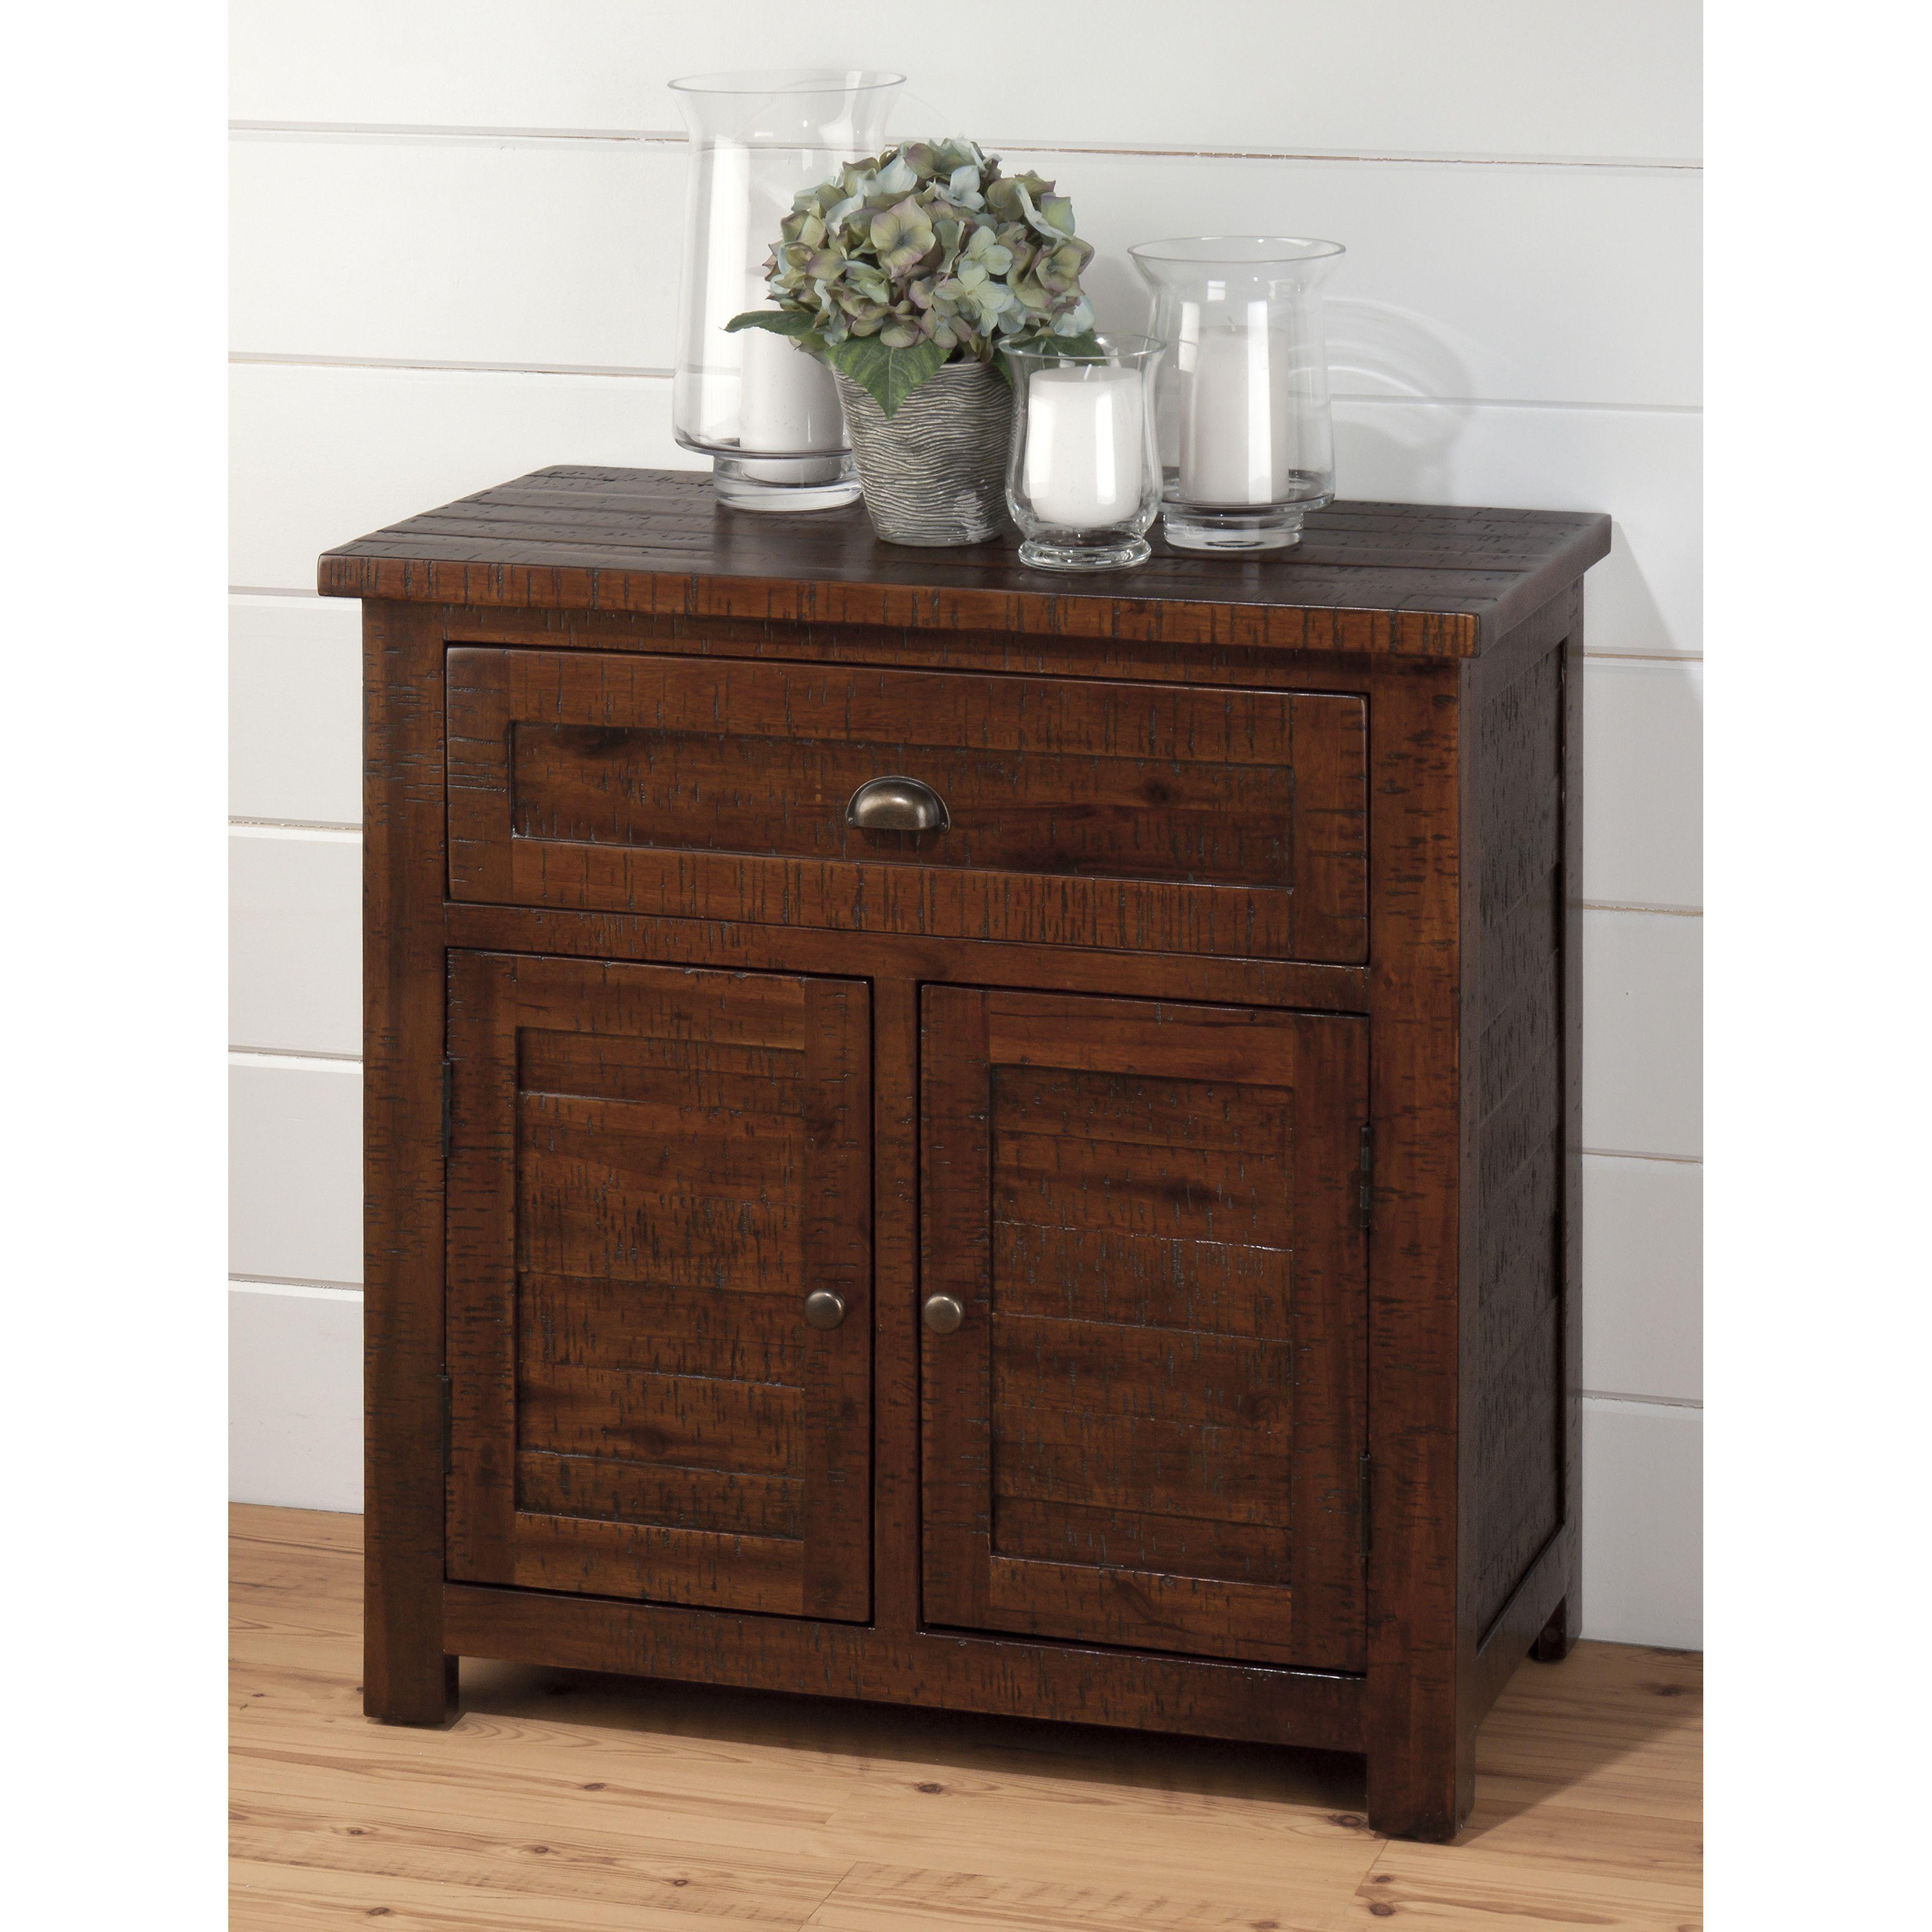 Jofran Urban Lodge Accent Cabinet Chest Furnituredining